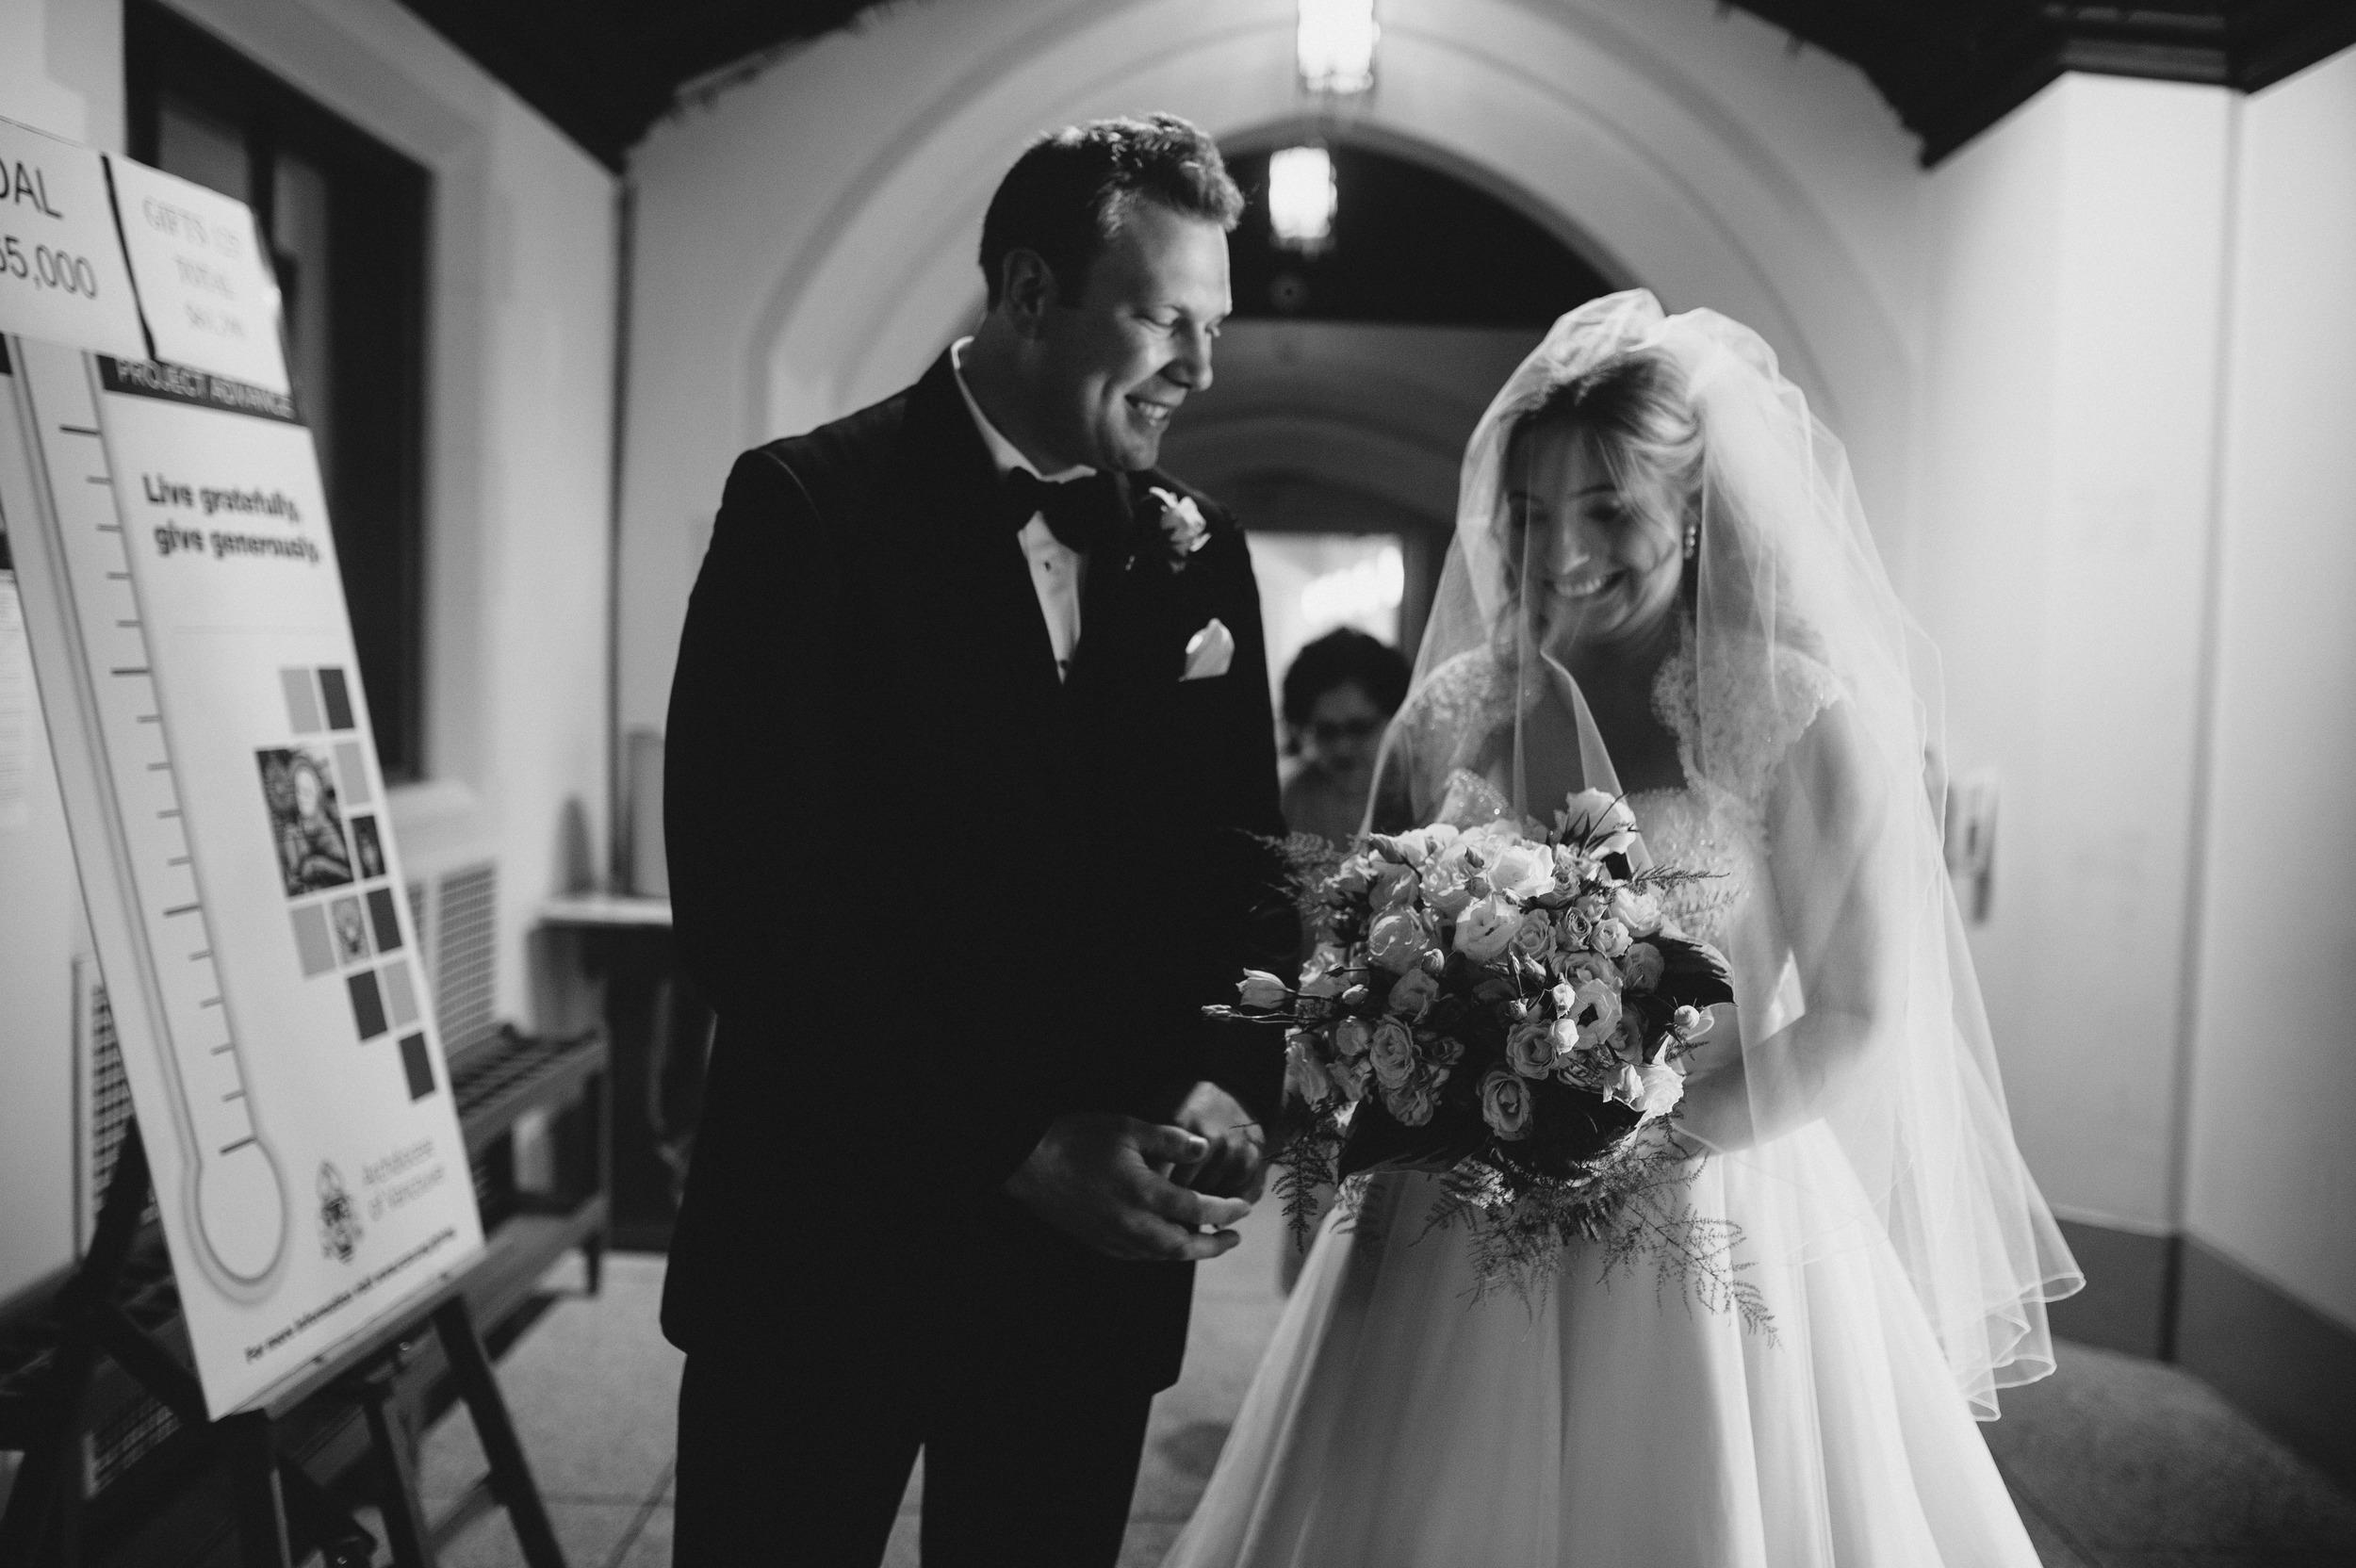 Vancouver St Augustine 's Church wedding photographer edward lai photography-32.jpg